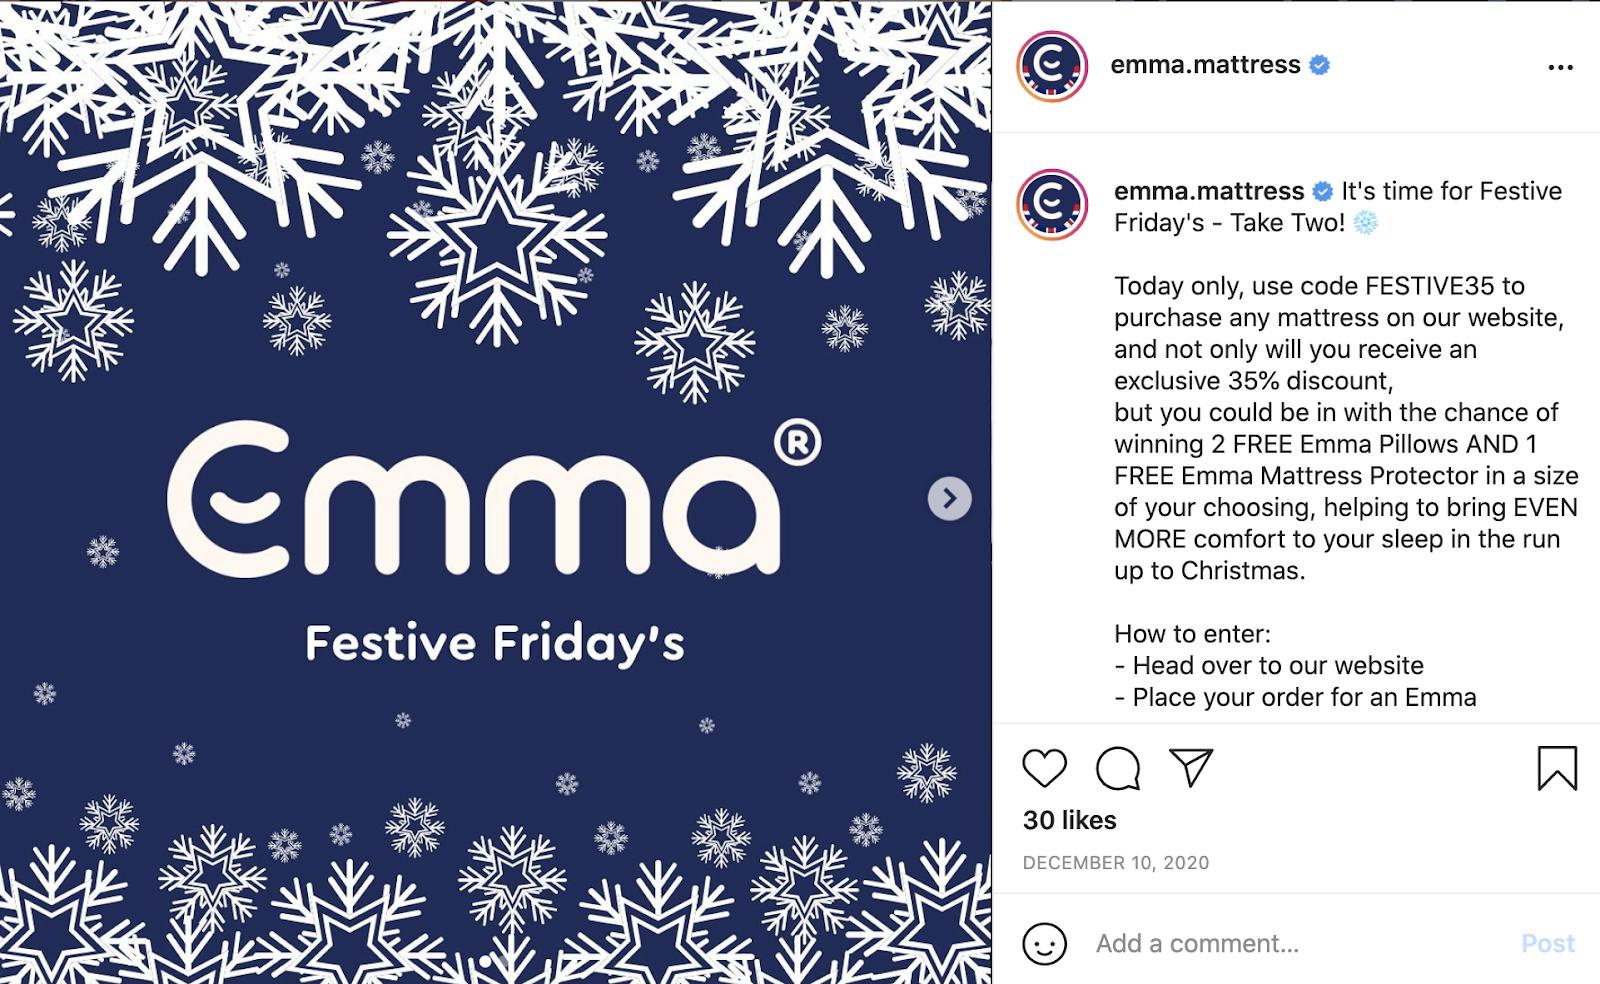 emma mattress christmas giveaway example